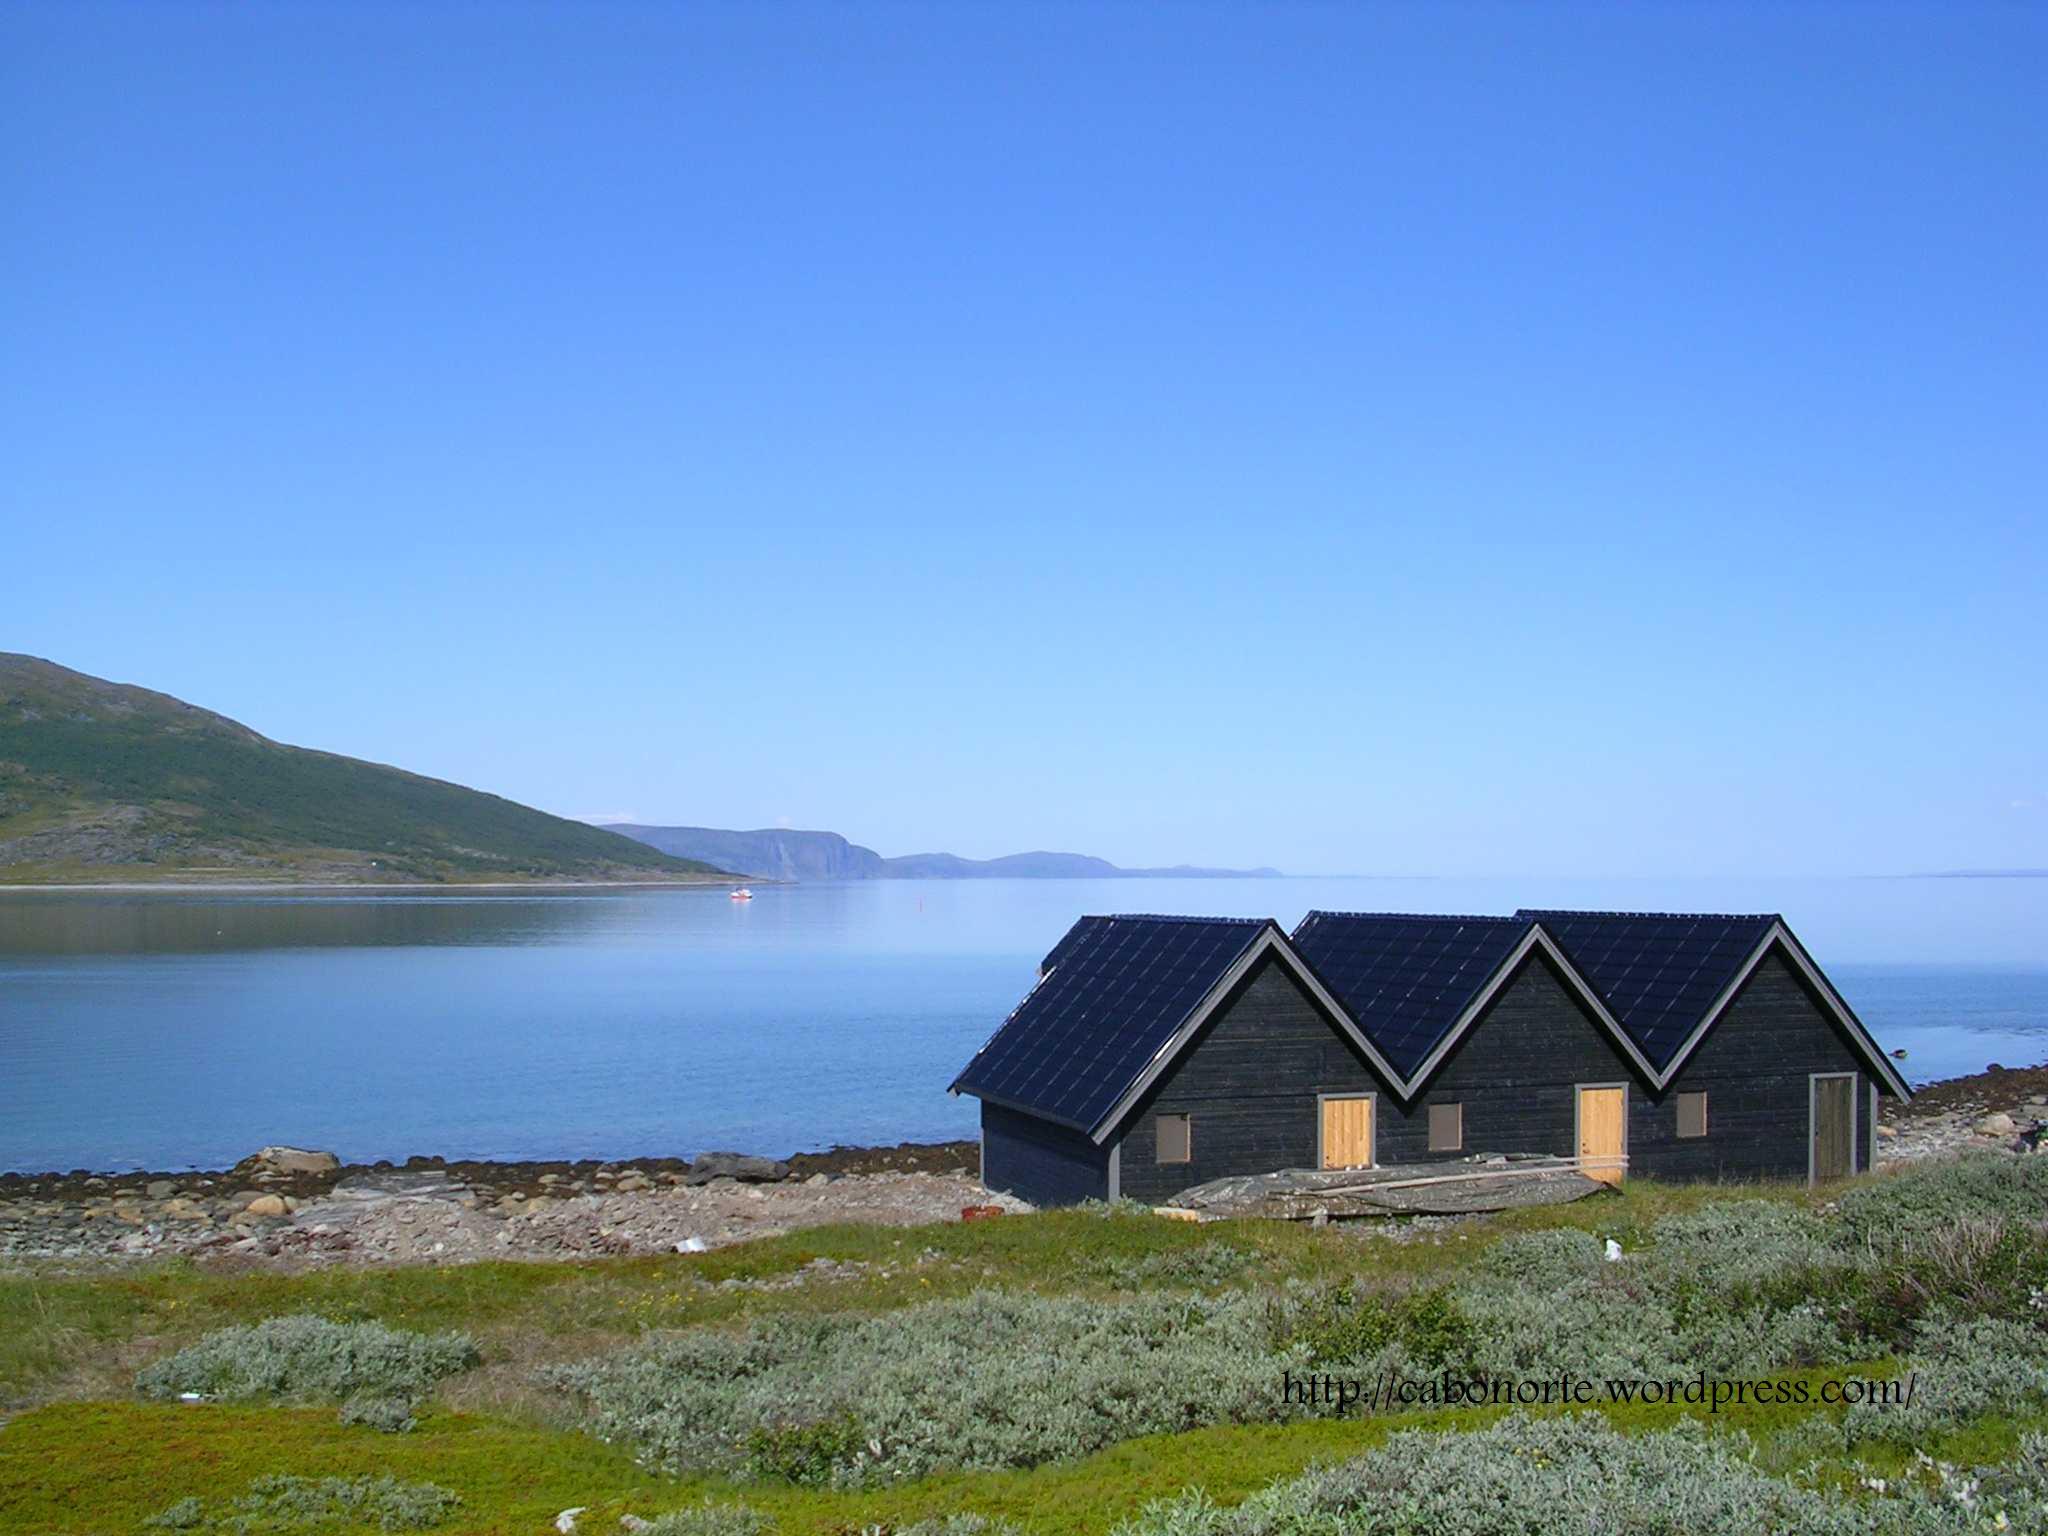 Porsangen Fjord, Norway